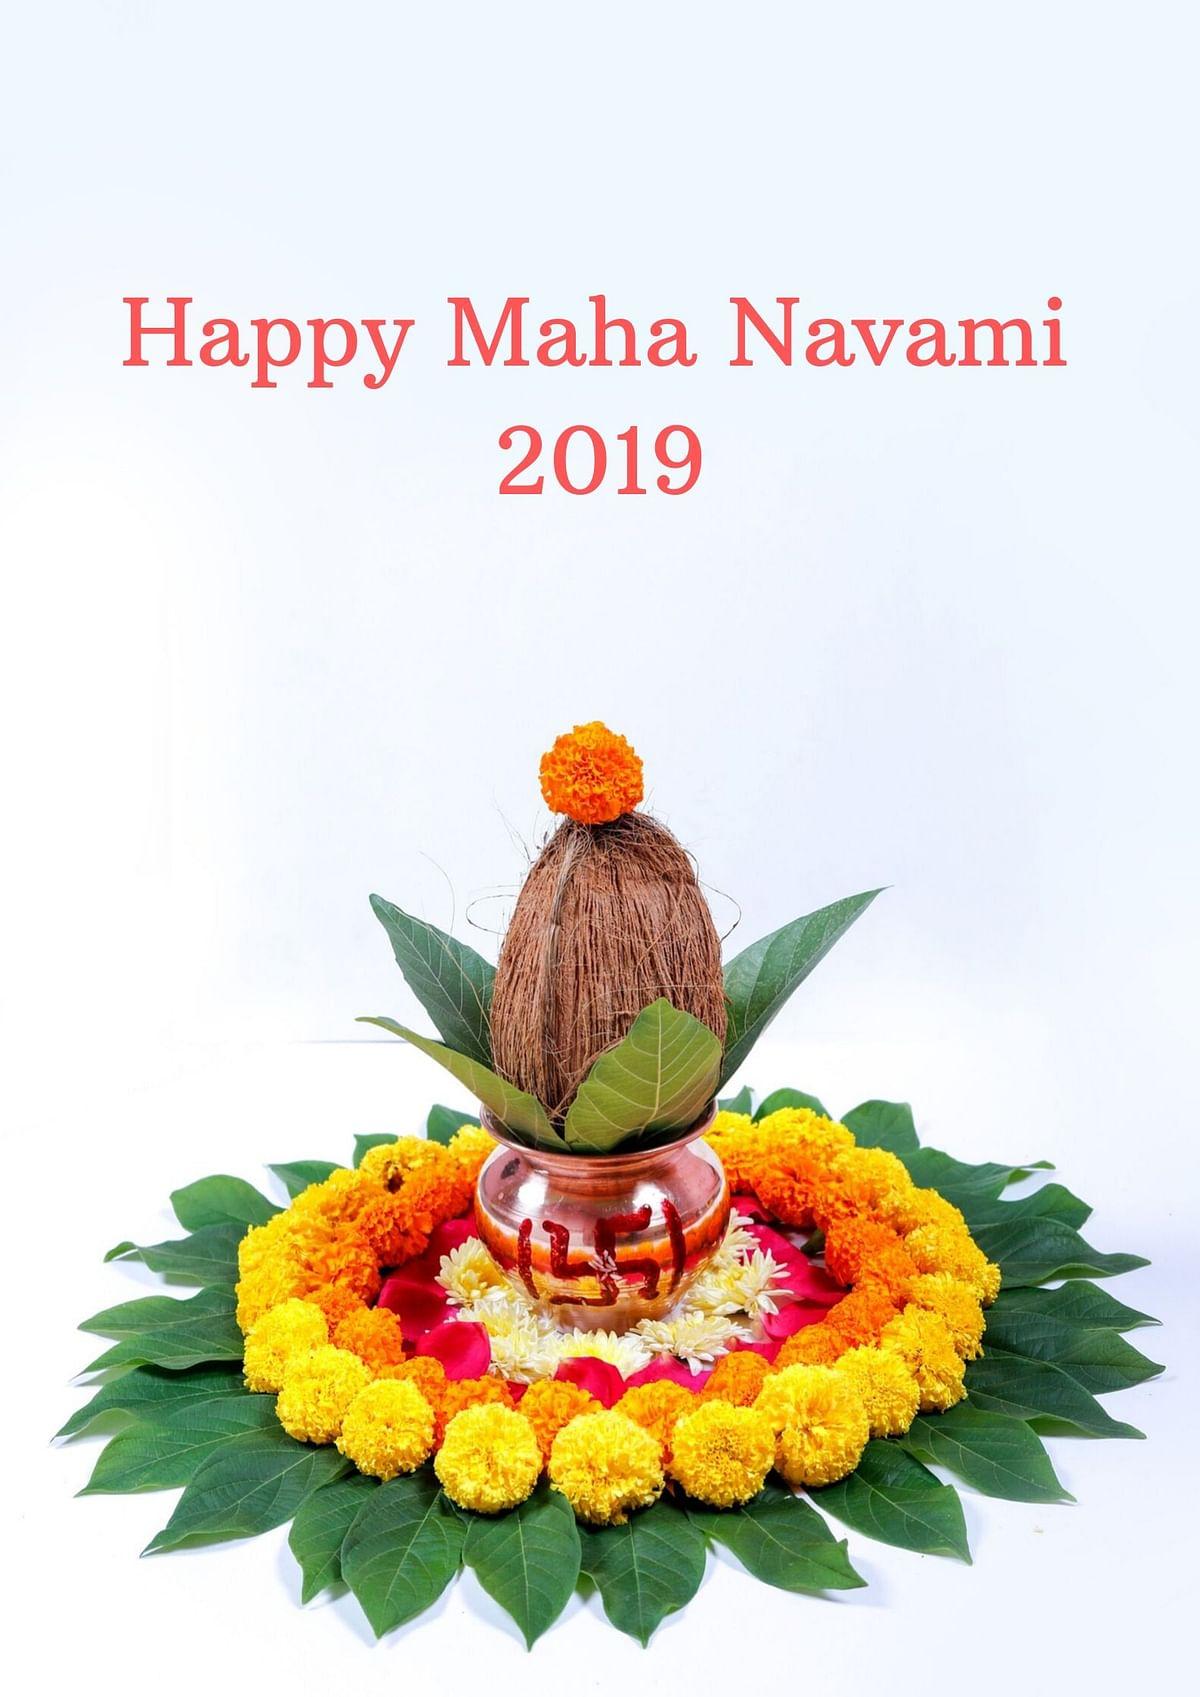 Happy Maha Navami (Durga Navami) 2019